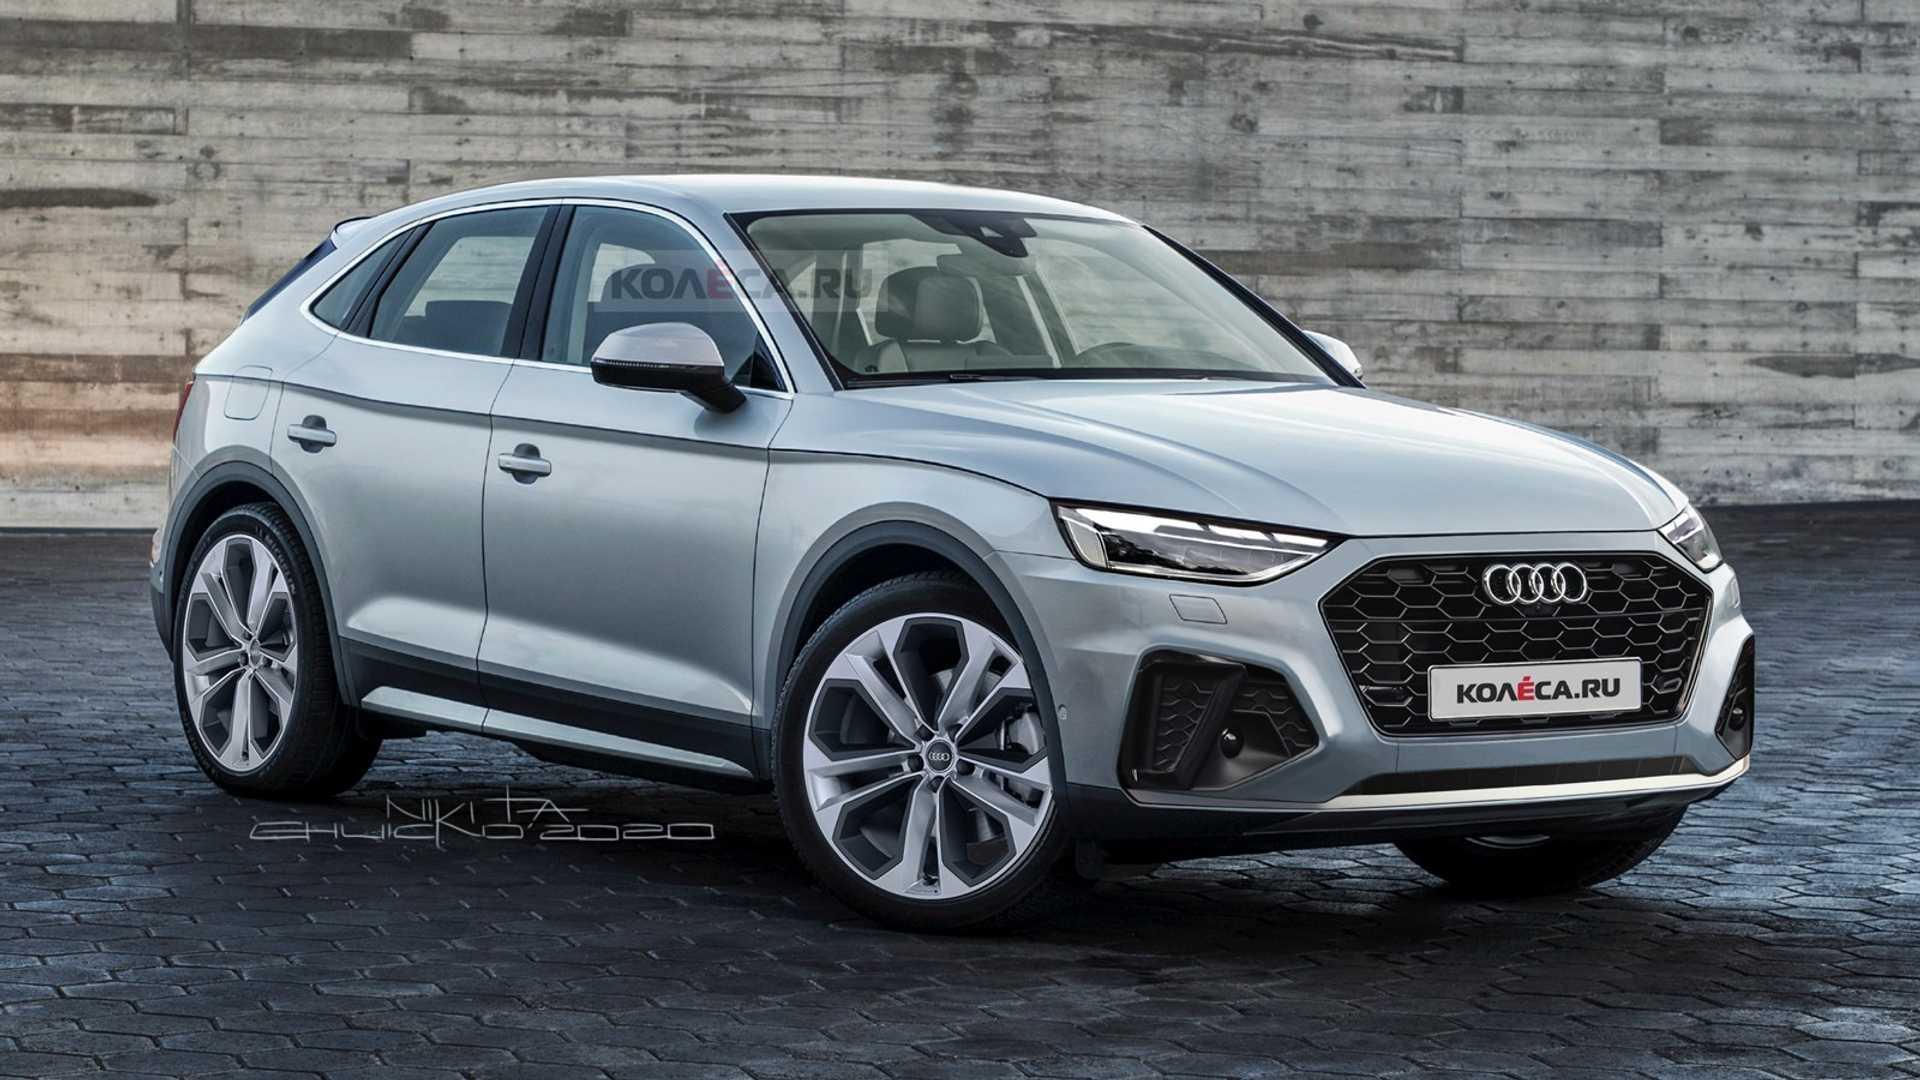 2021 Audi Q3 Usa Speed Test